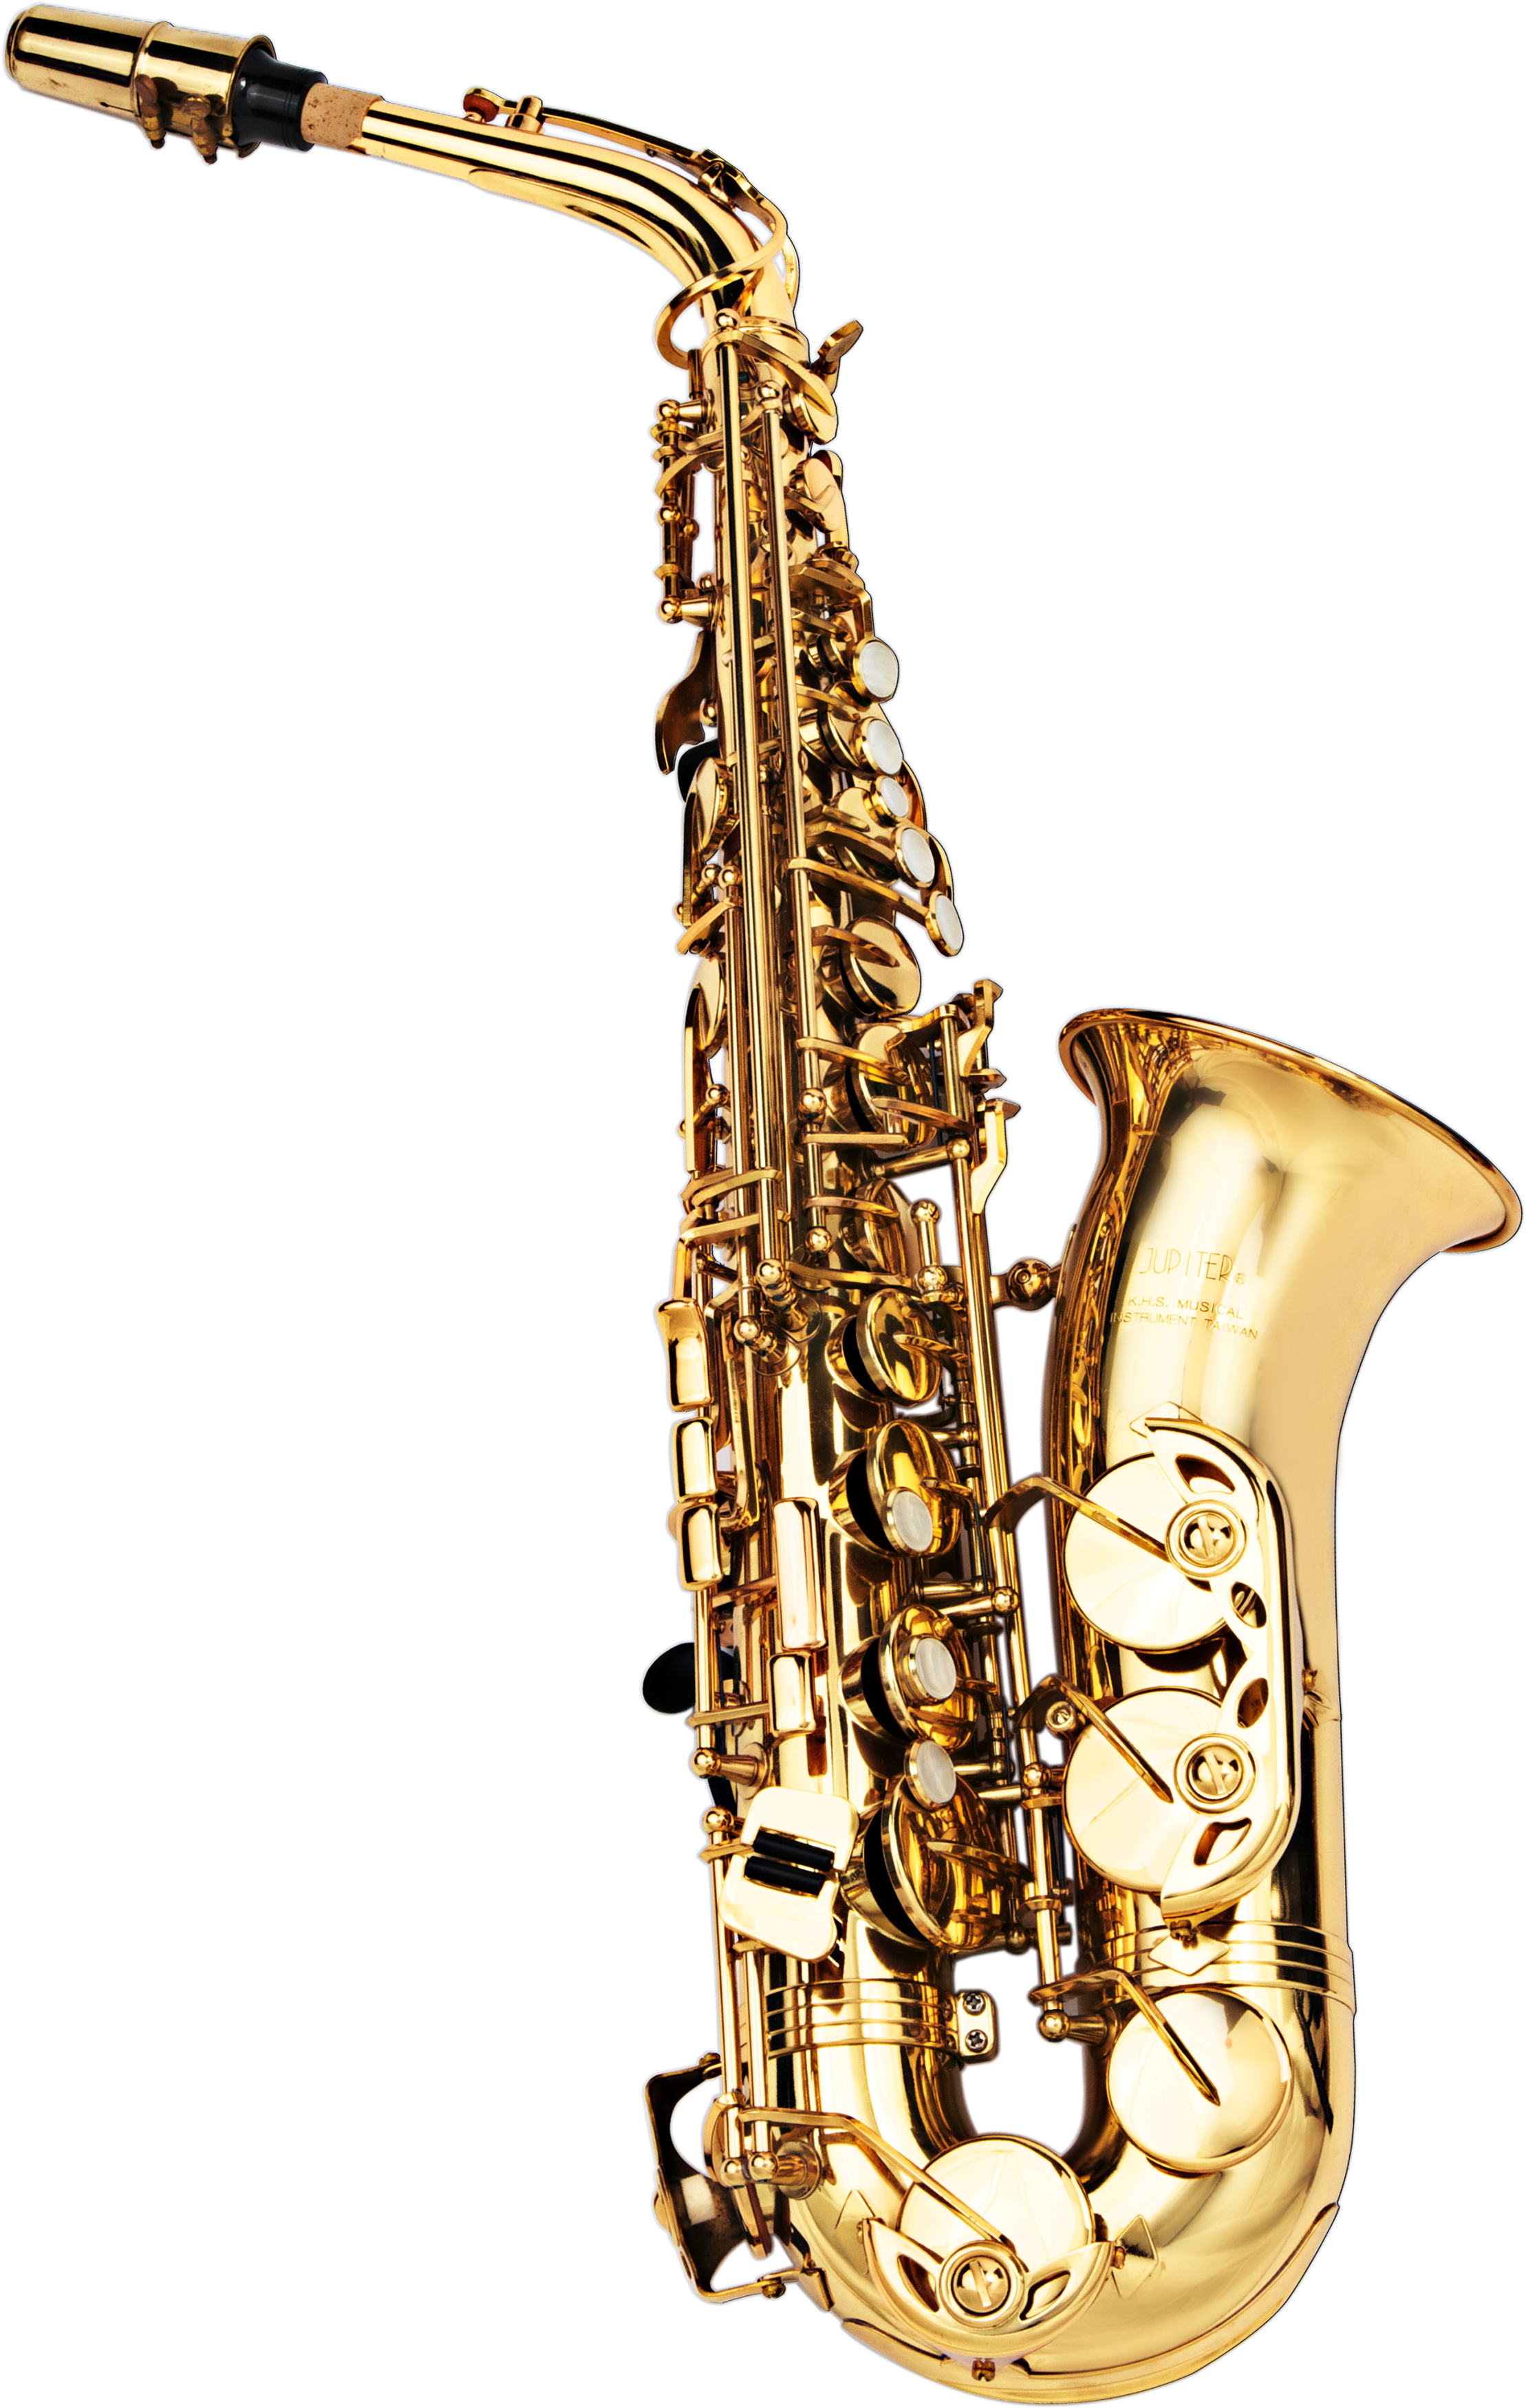 Saxophone PNG Image